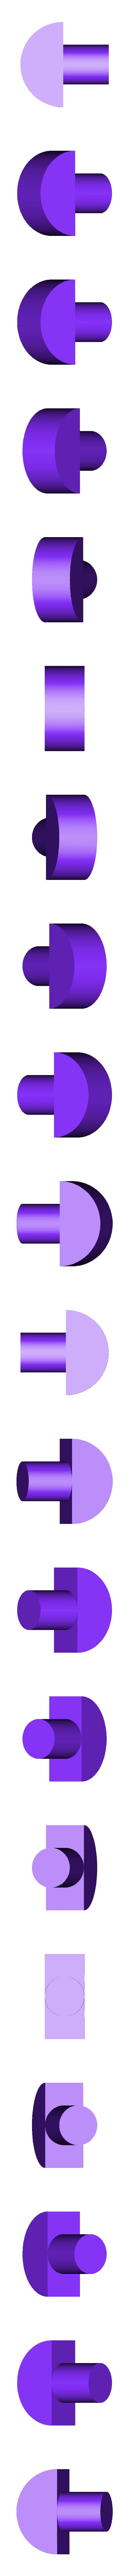 Oreille_x1_Click and smile_studio klipsi V1.1.stl Download free STL file Action figure - CLICK & SMILE - Starter pack • Model to 3D print, StudioKlipsi